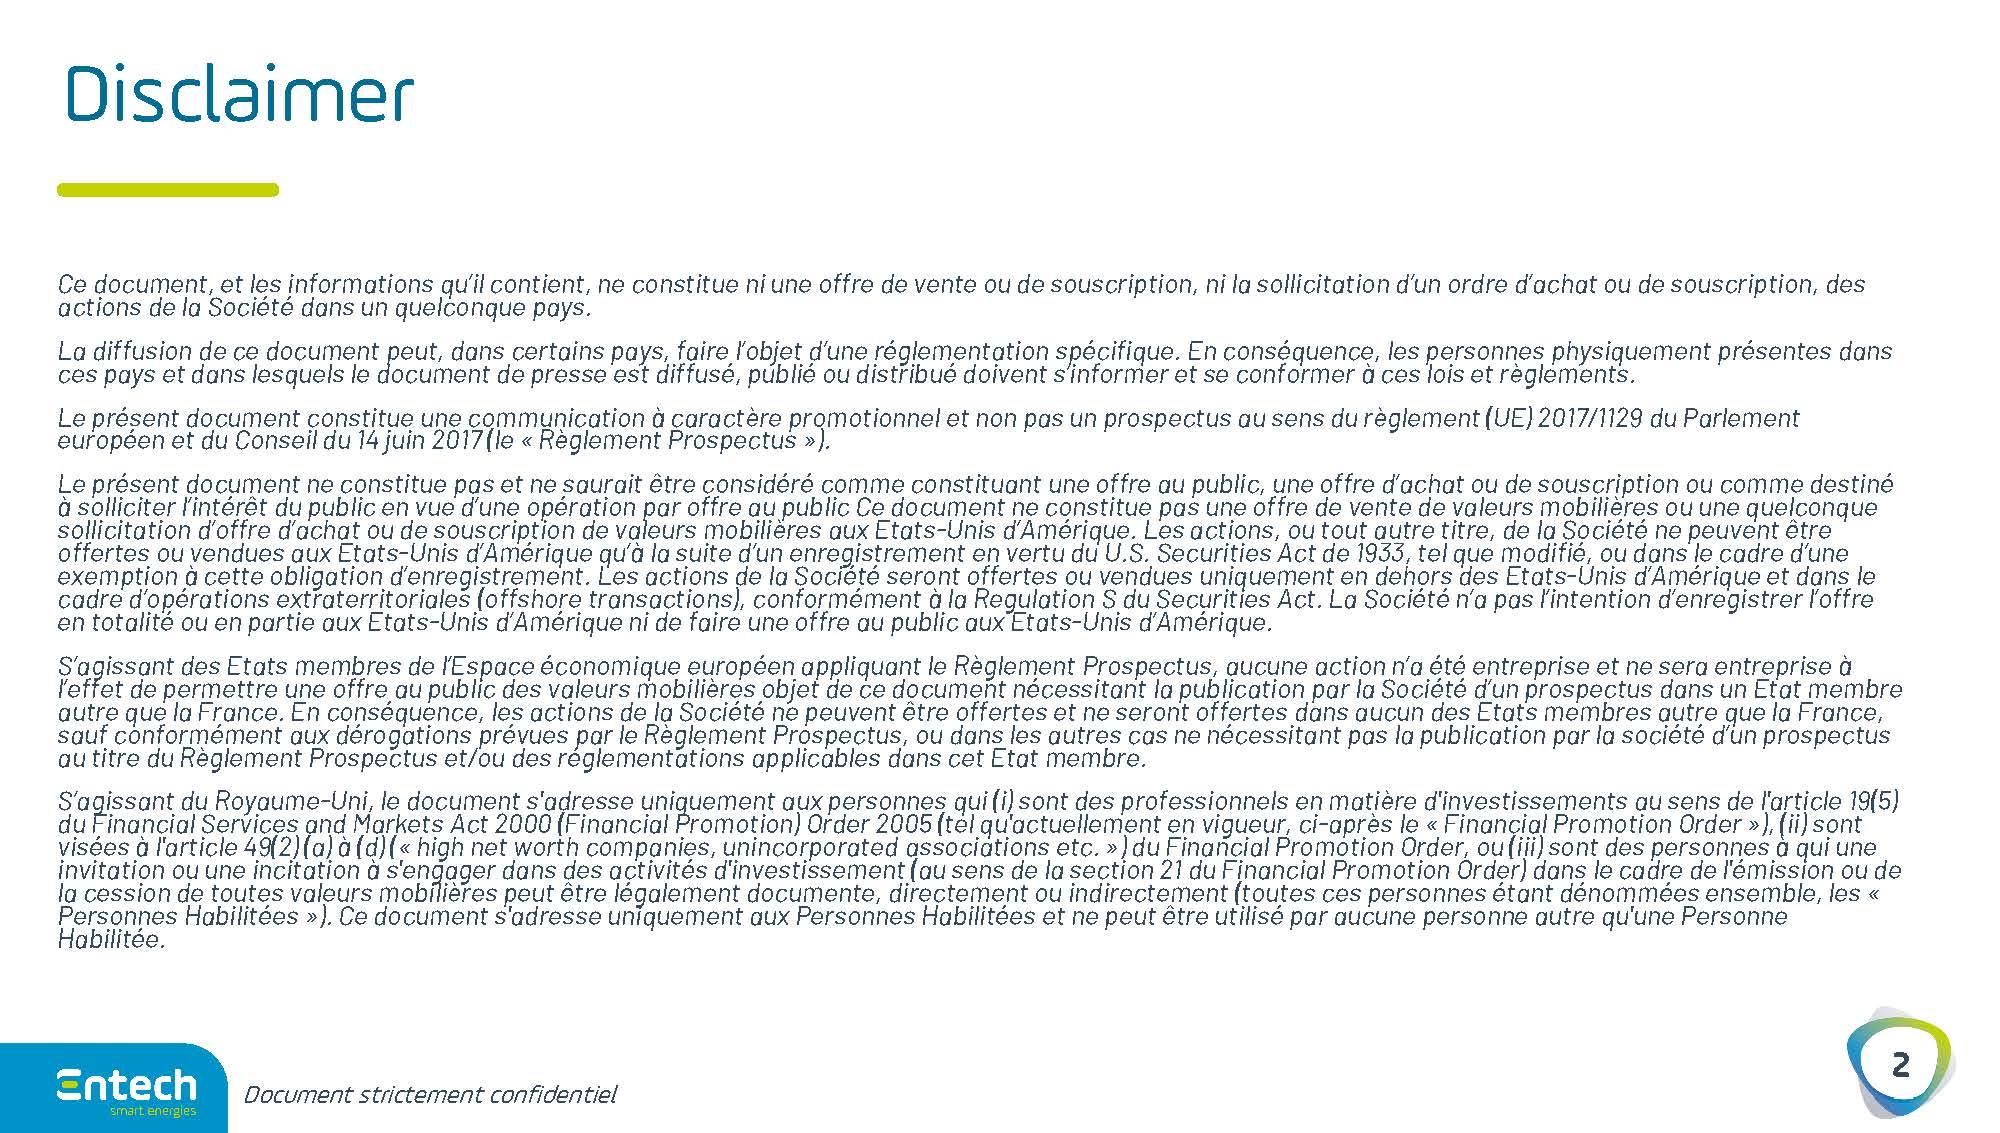 ENTECH_PRES_IPO_210914_FR_Page_02